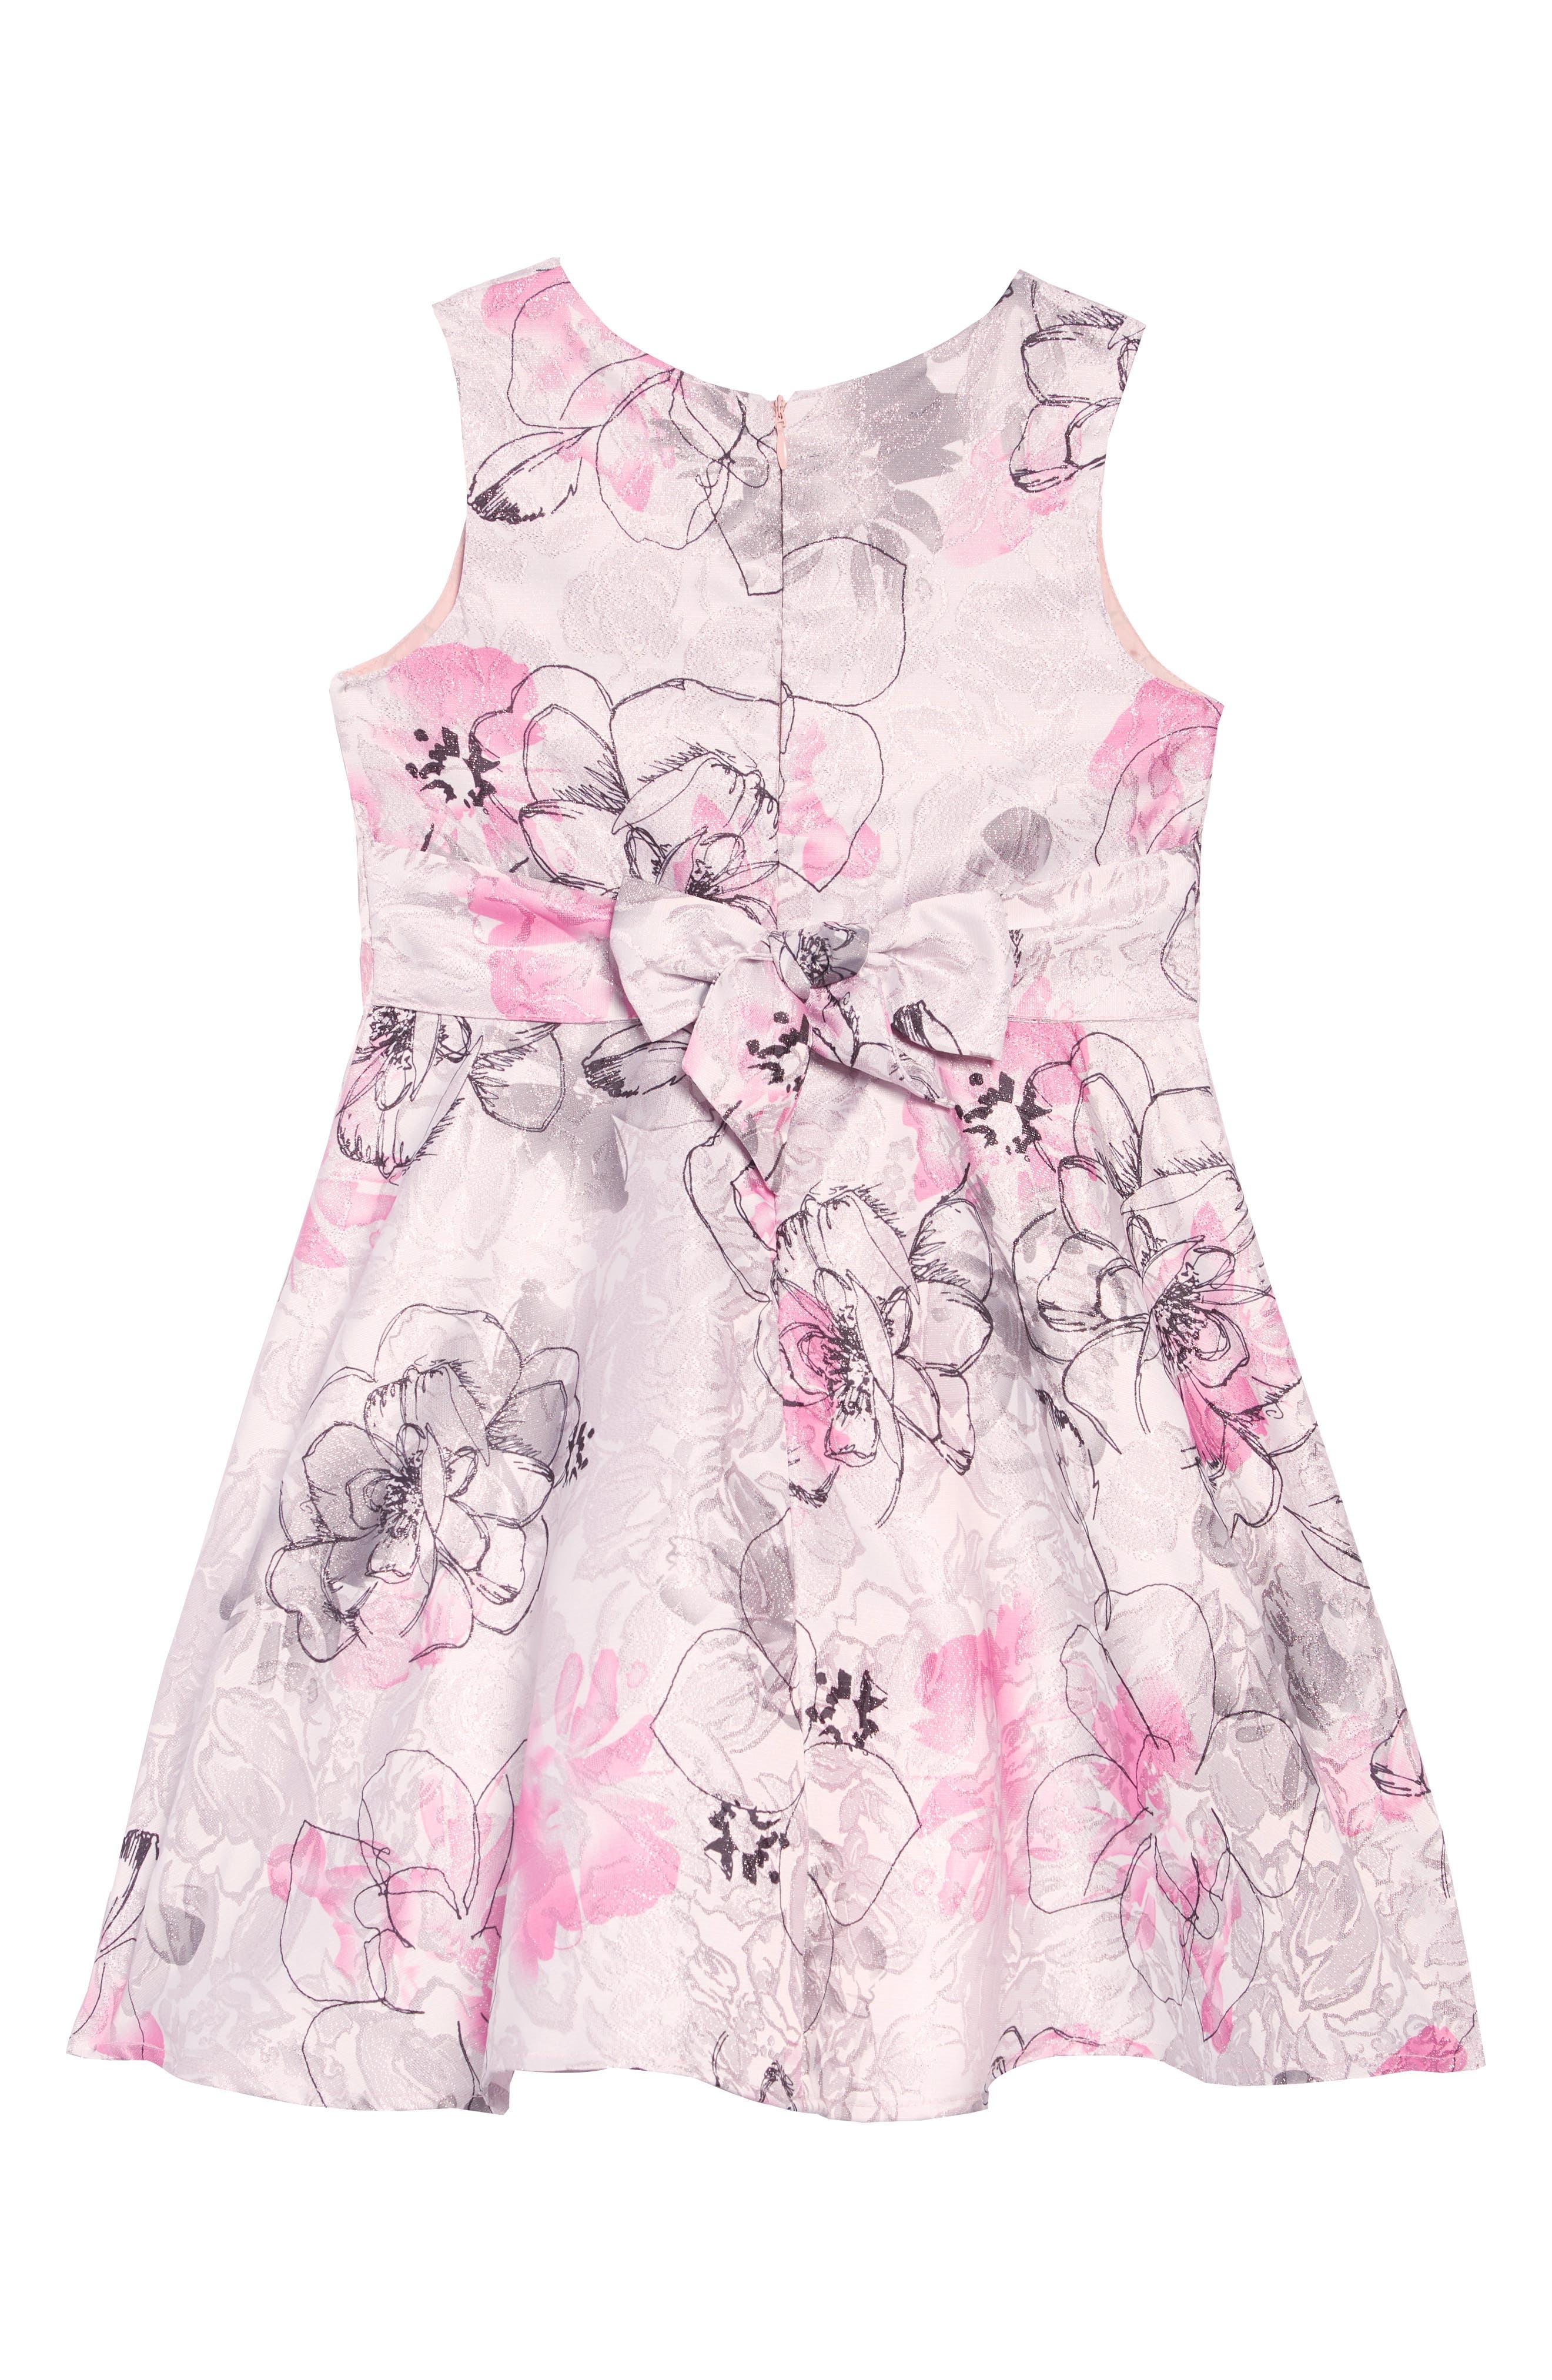 Jacquard Floral Dress,                             Alternate thumbnail 2, color,                             650